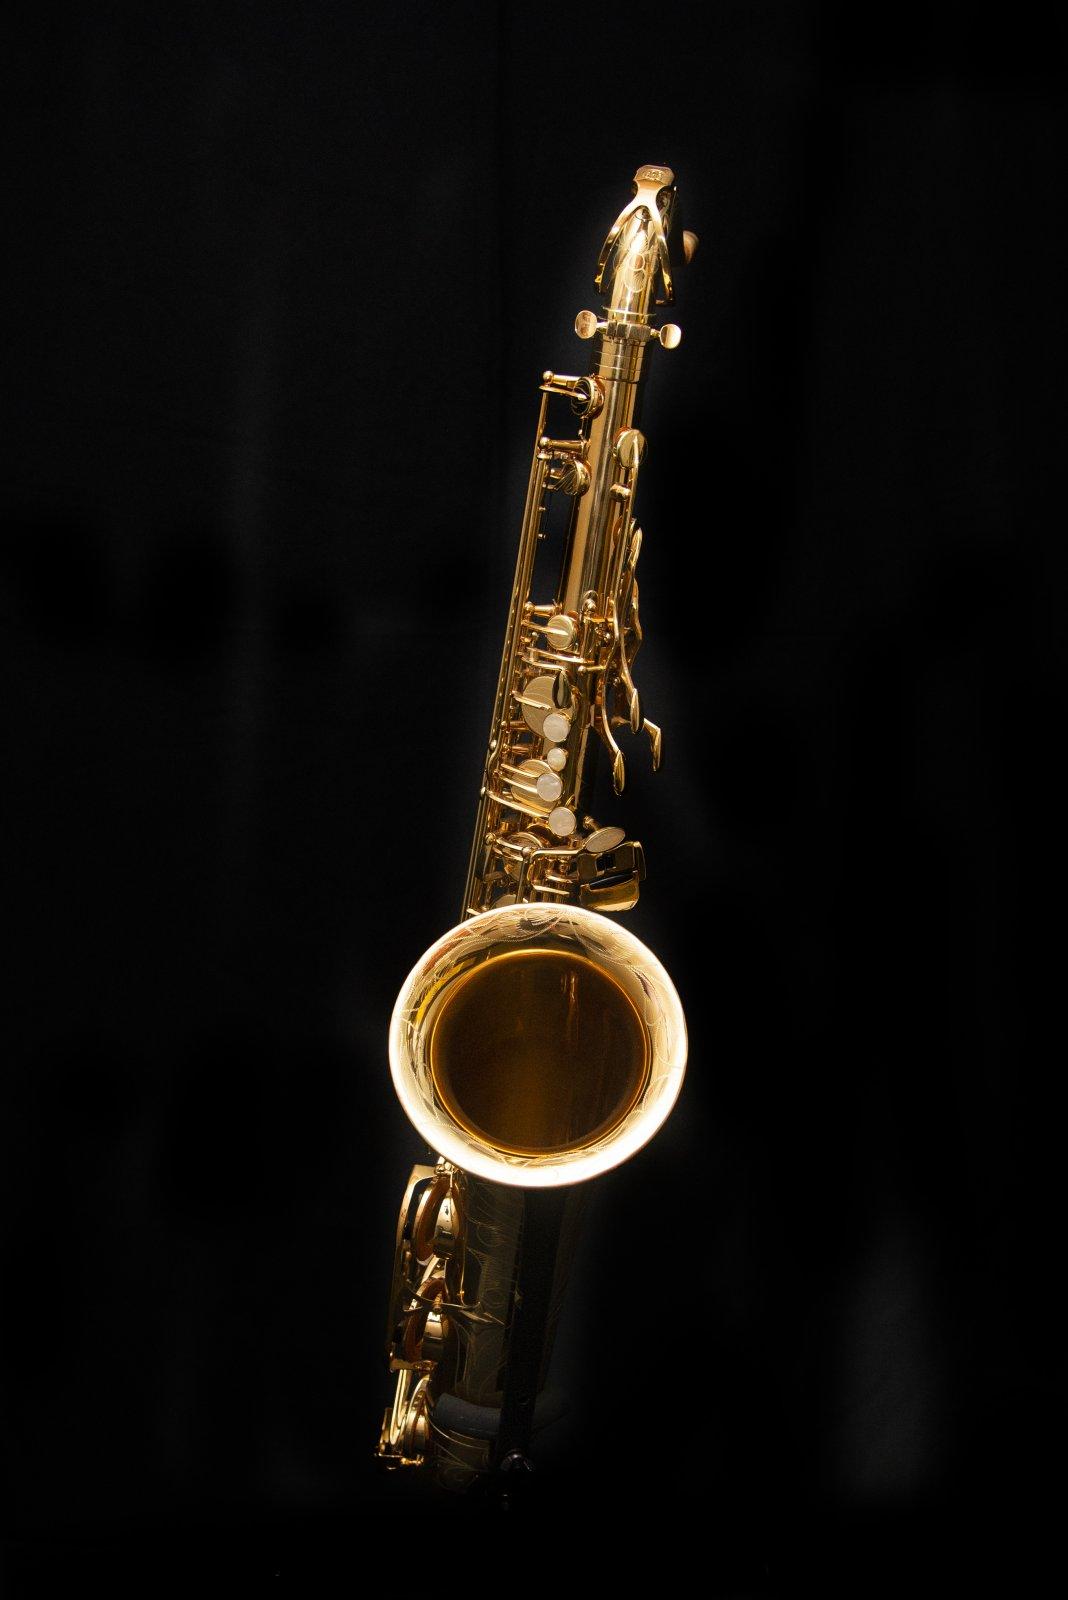 Fabulous Buffet Crampon 400 Series Professional Tenor Saxophone Download Free Architecture Designs Intelgarnamadebymaigaardcom